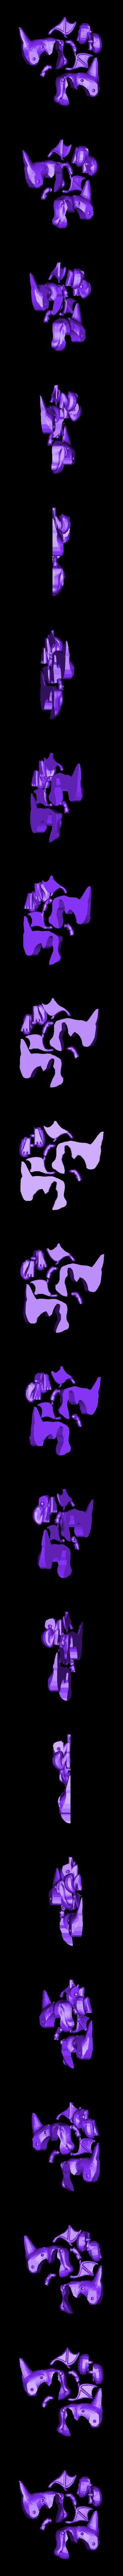 yoshi-vert-lisse.STL Download free STL file Dragon bicolor • 3D printer model, proteine